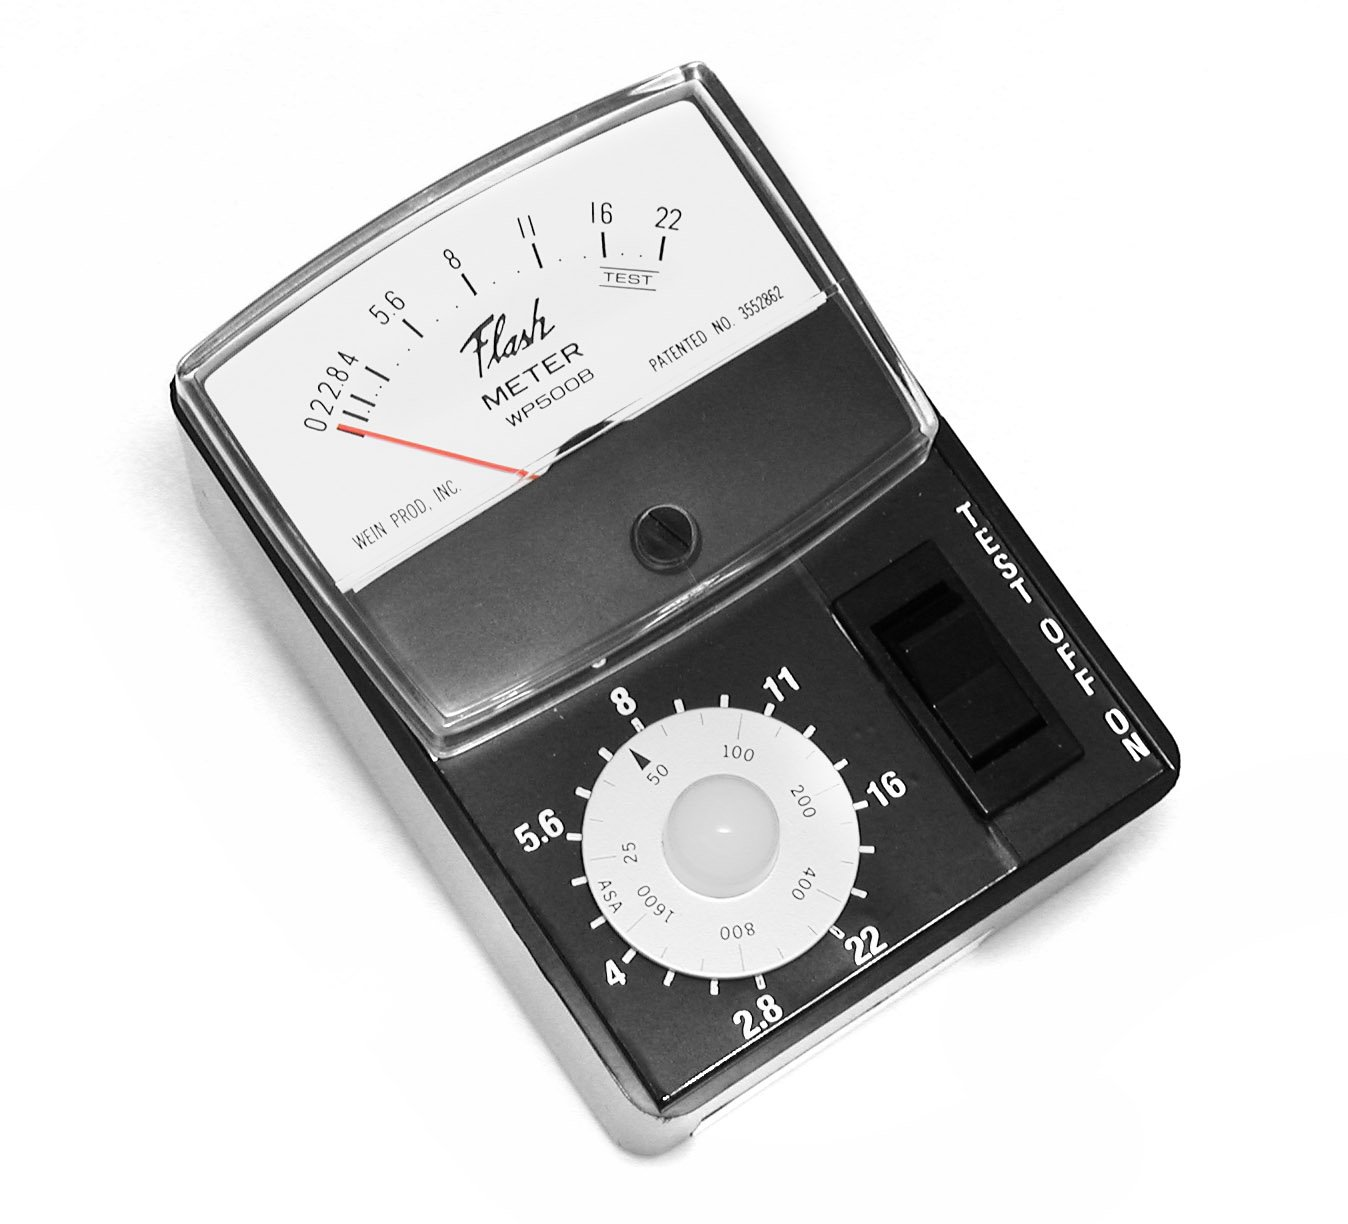 Wein Products W950010 (WP-500B) Standard Flashmeter